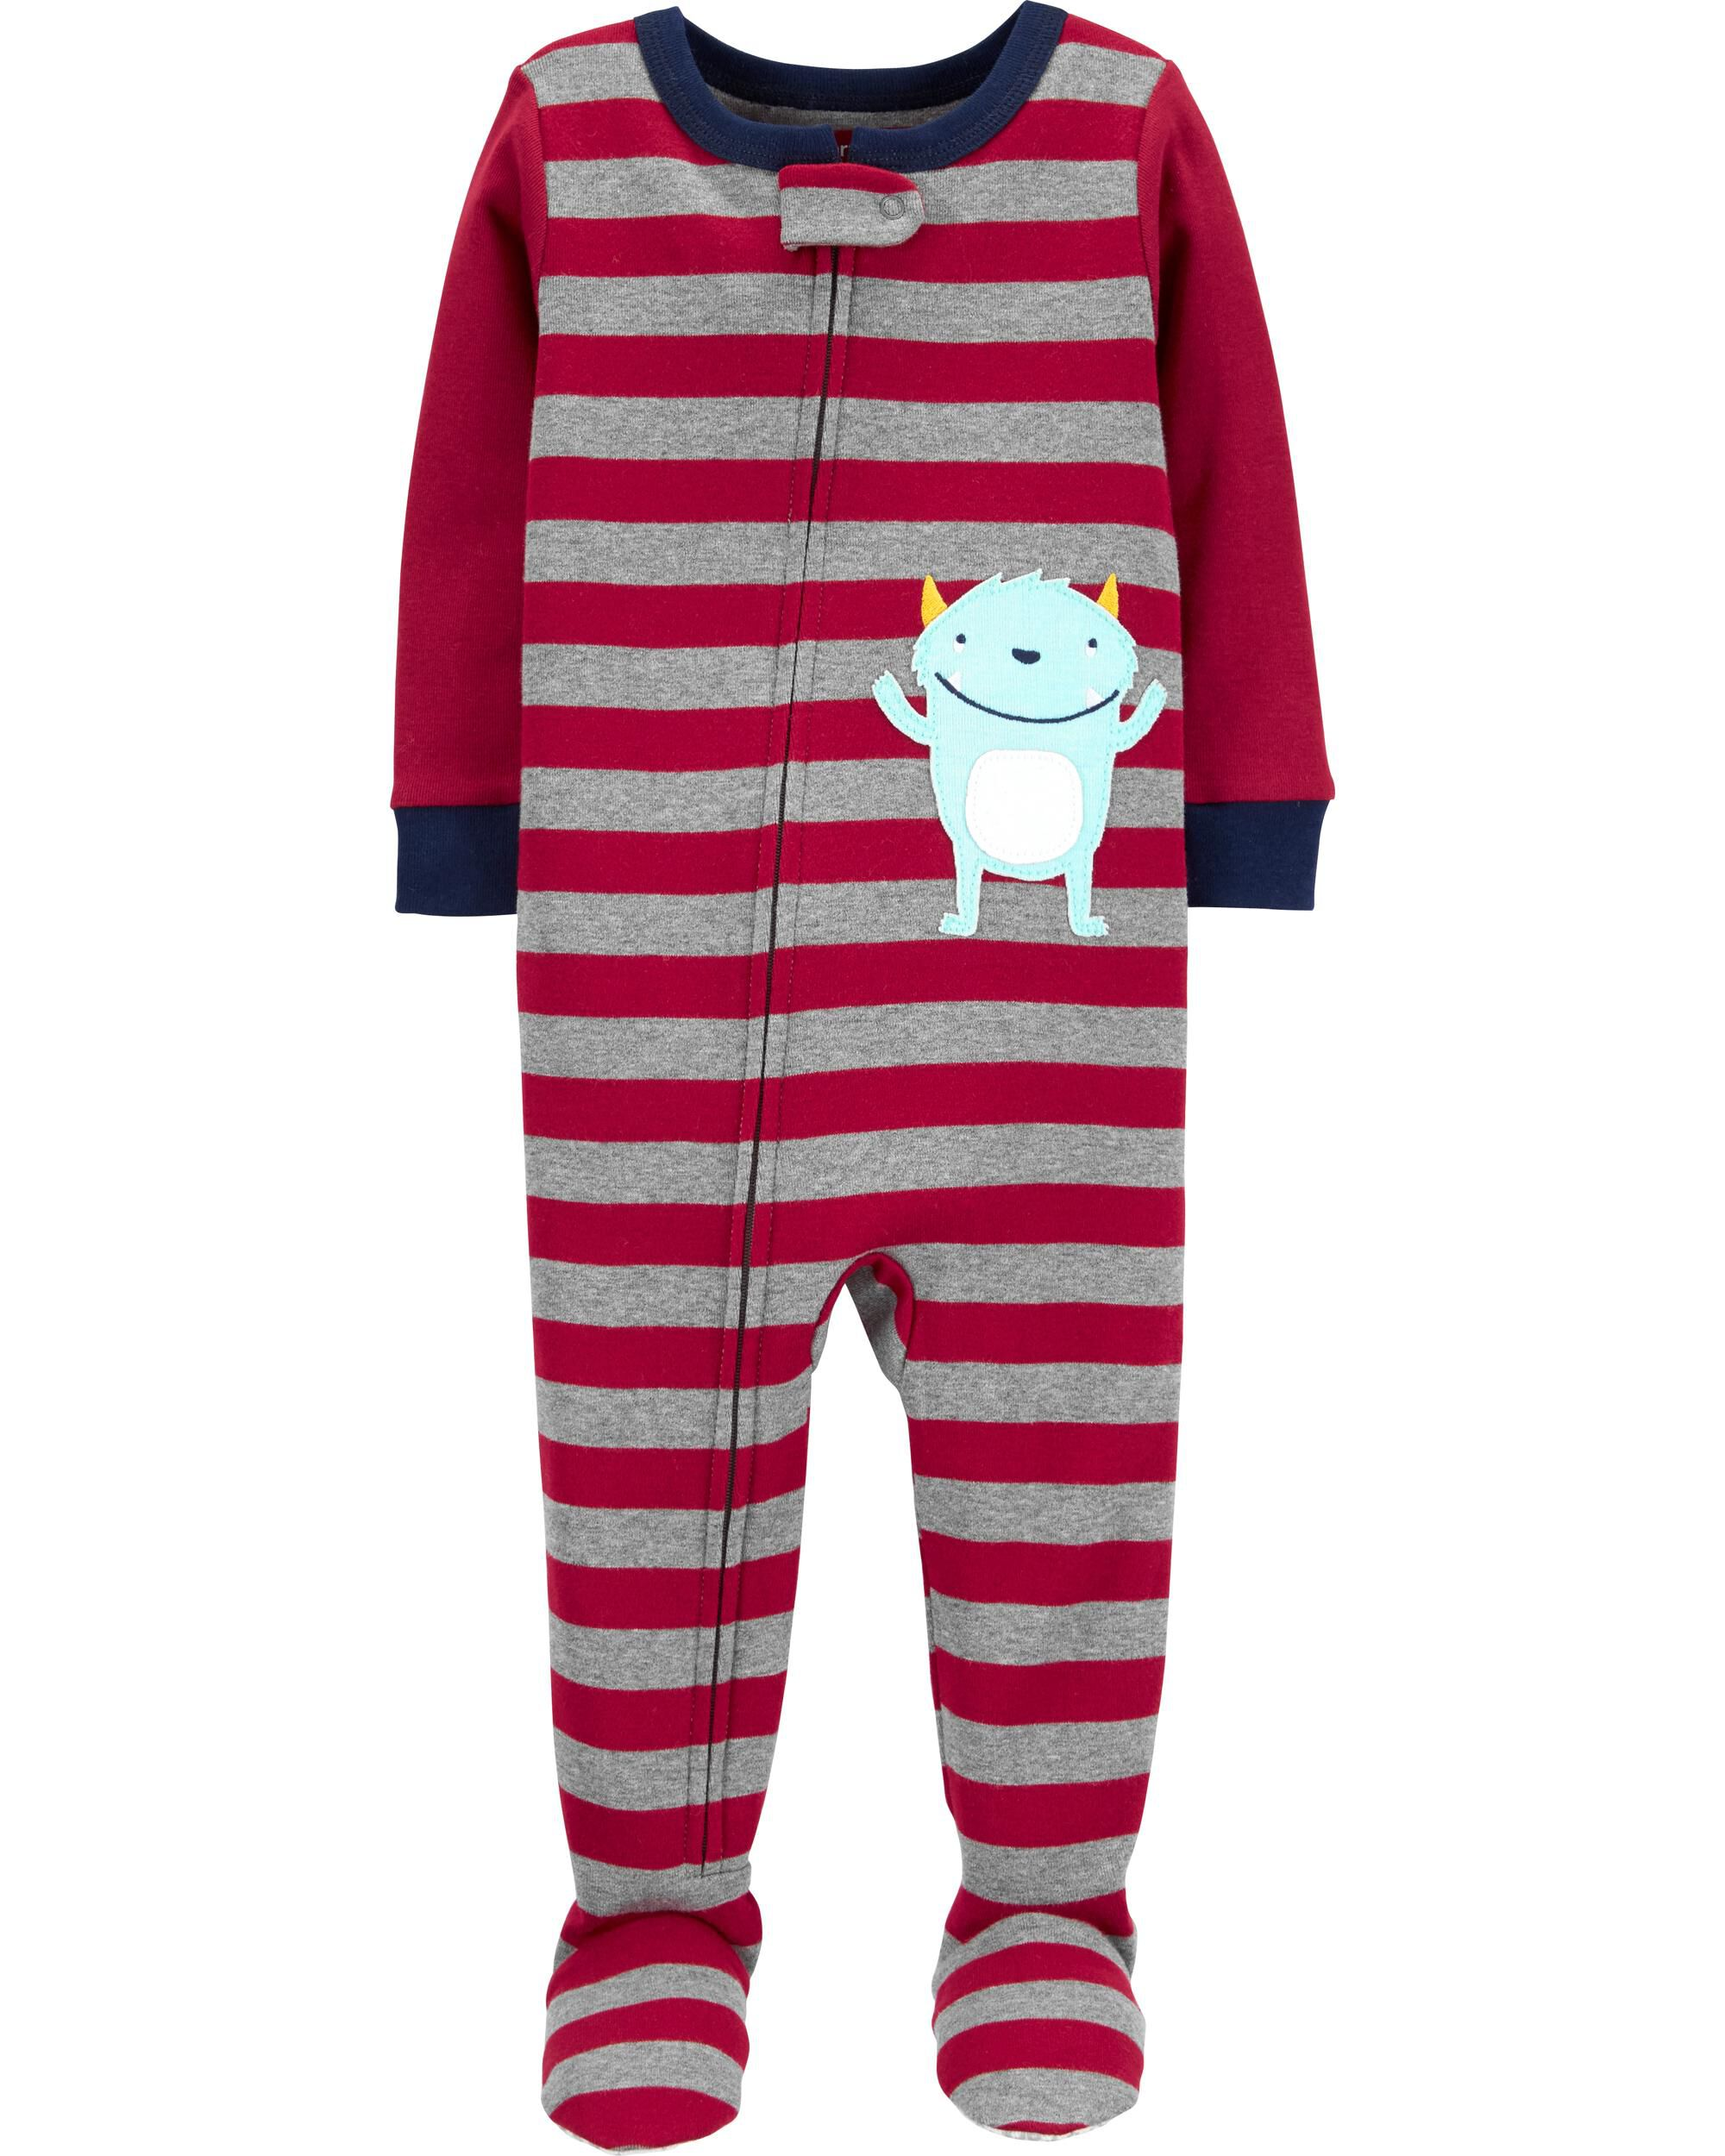 Carters Baby Boys 12M-3T One Piece Striped Dino Pocket Snug Fit Cotton PJS